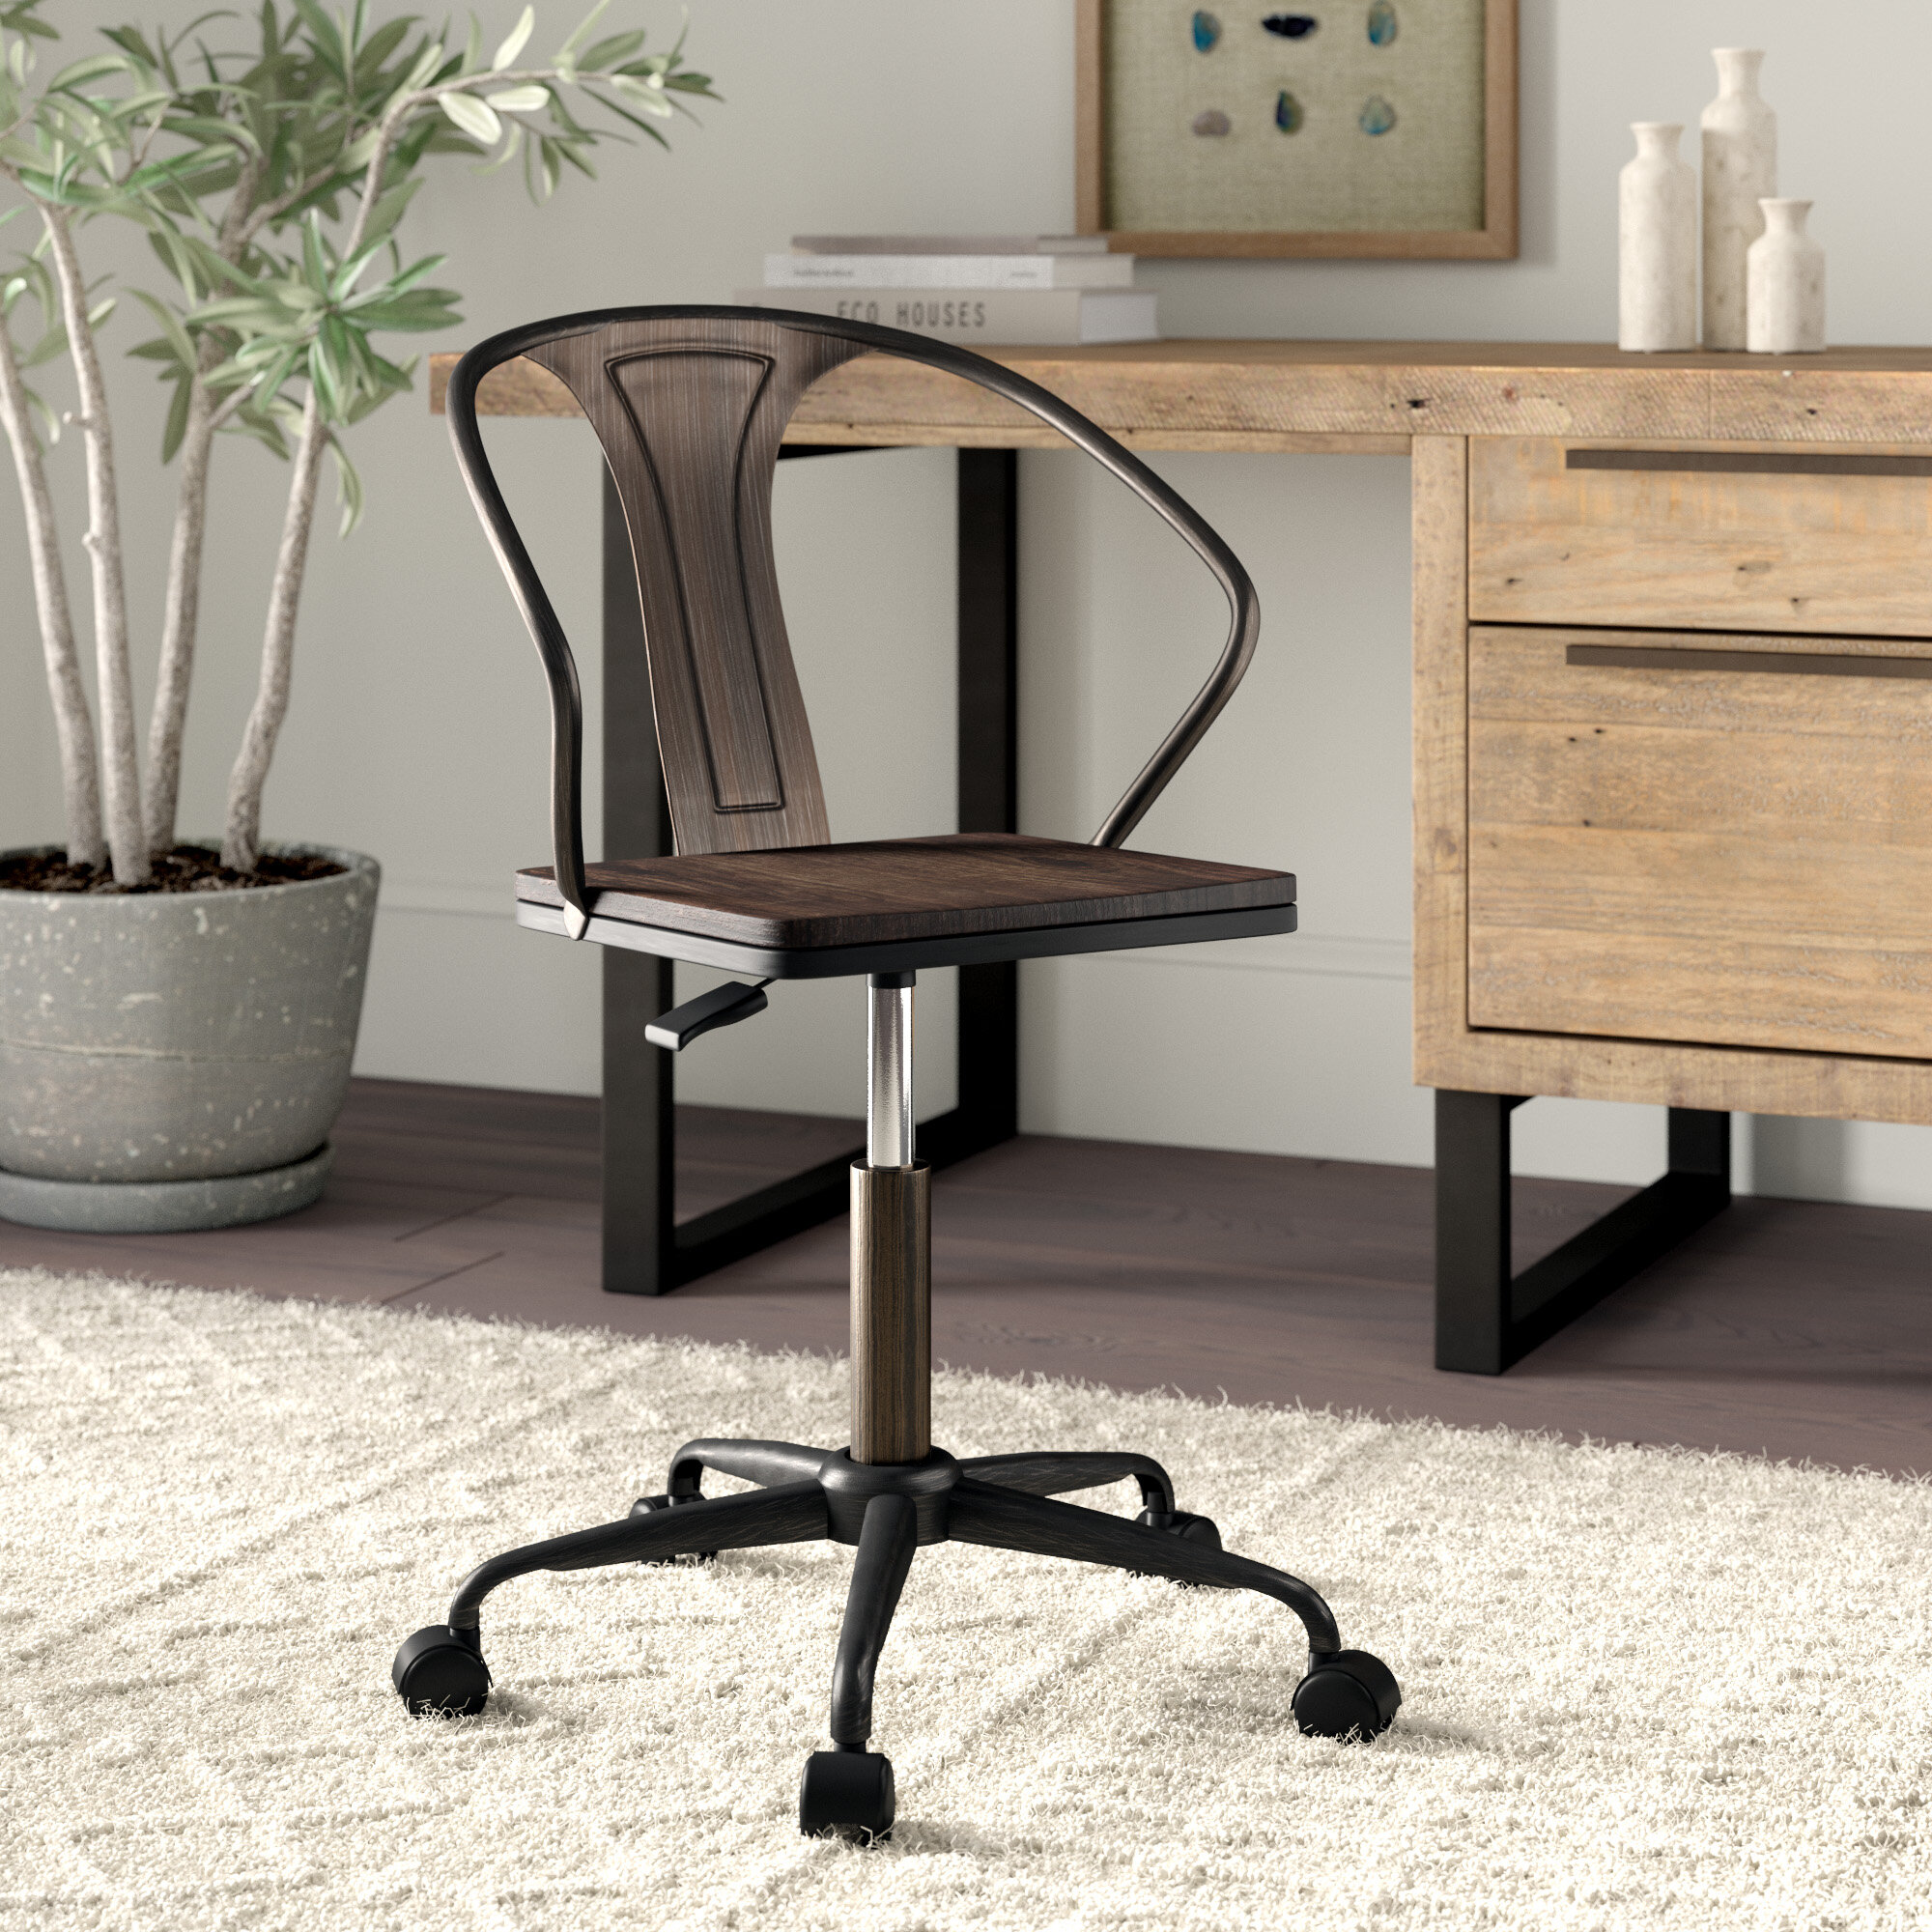 Greyleigh aledo industrial office chair reviews wayfair